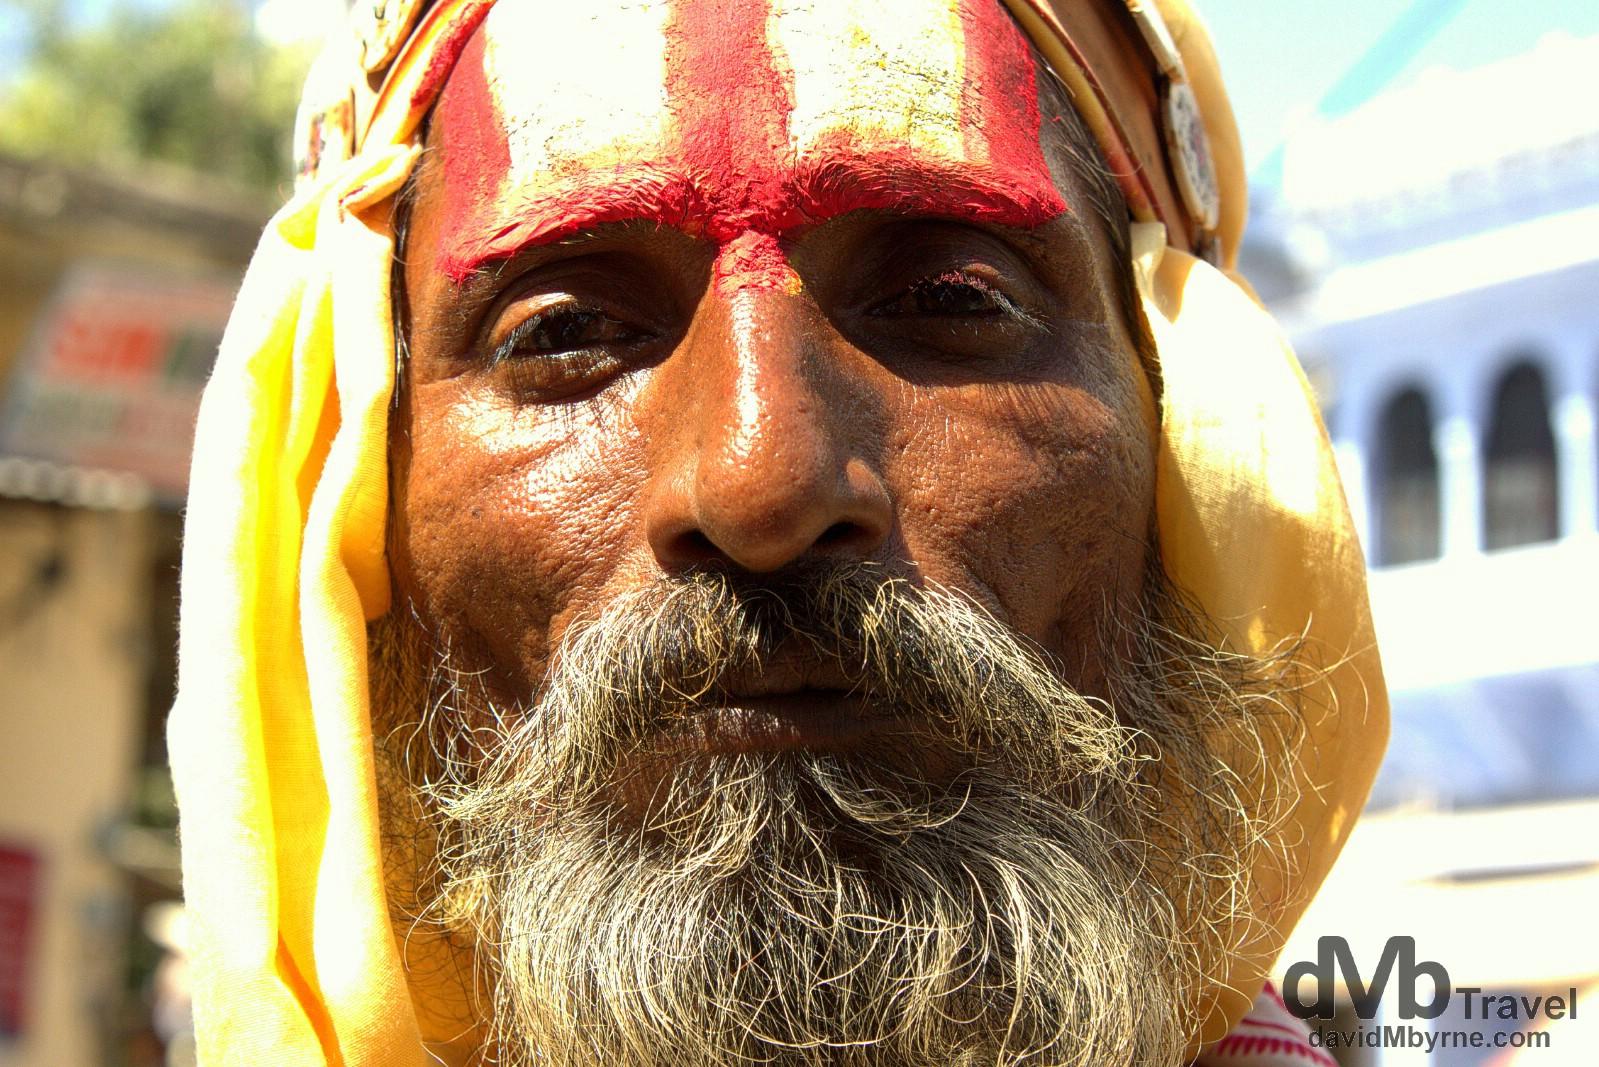 A Sadu, a Hindu holy man, on the streets of Pushkar, Rajasthan, India. October 3rd 2012.